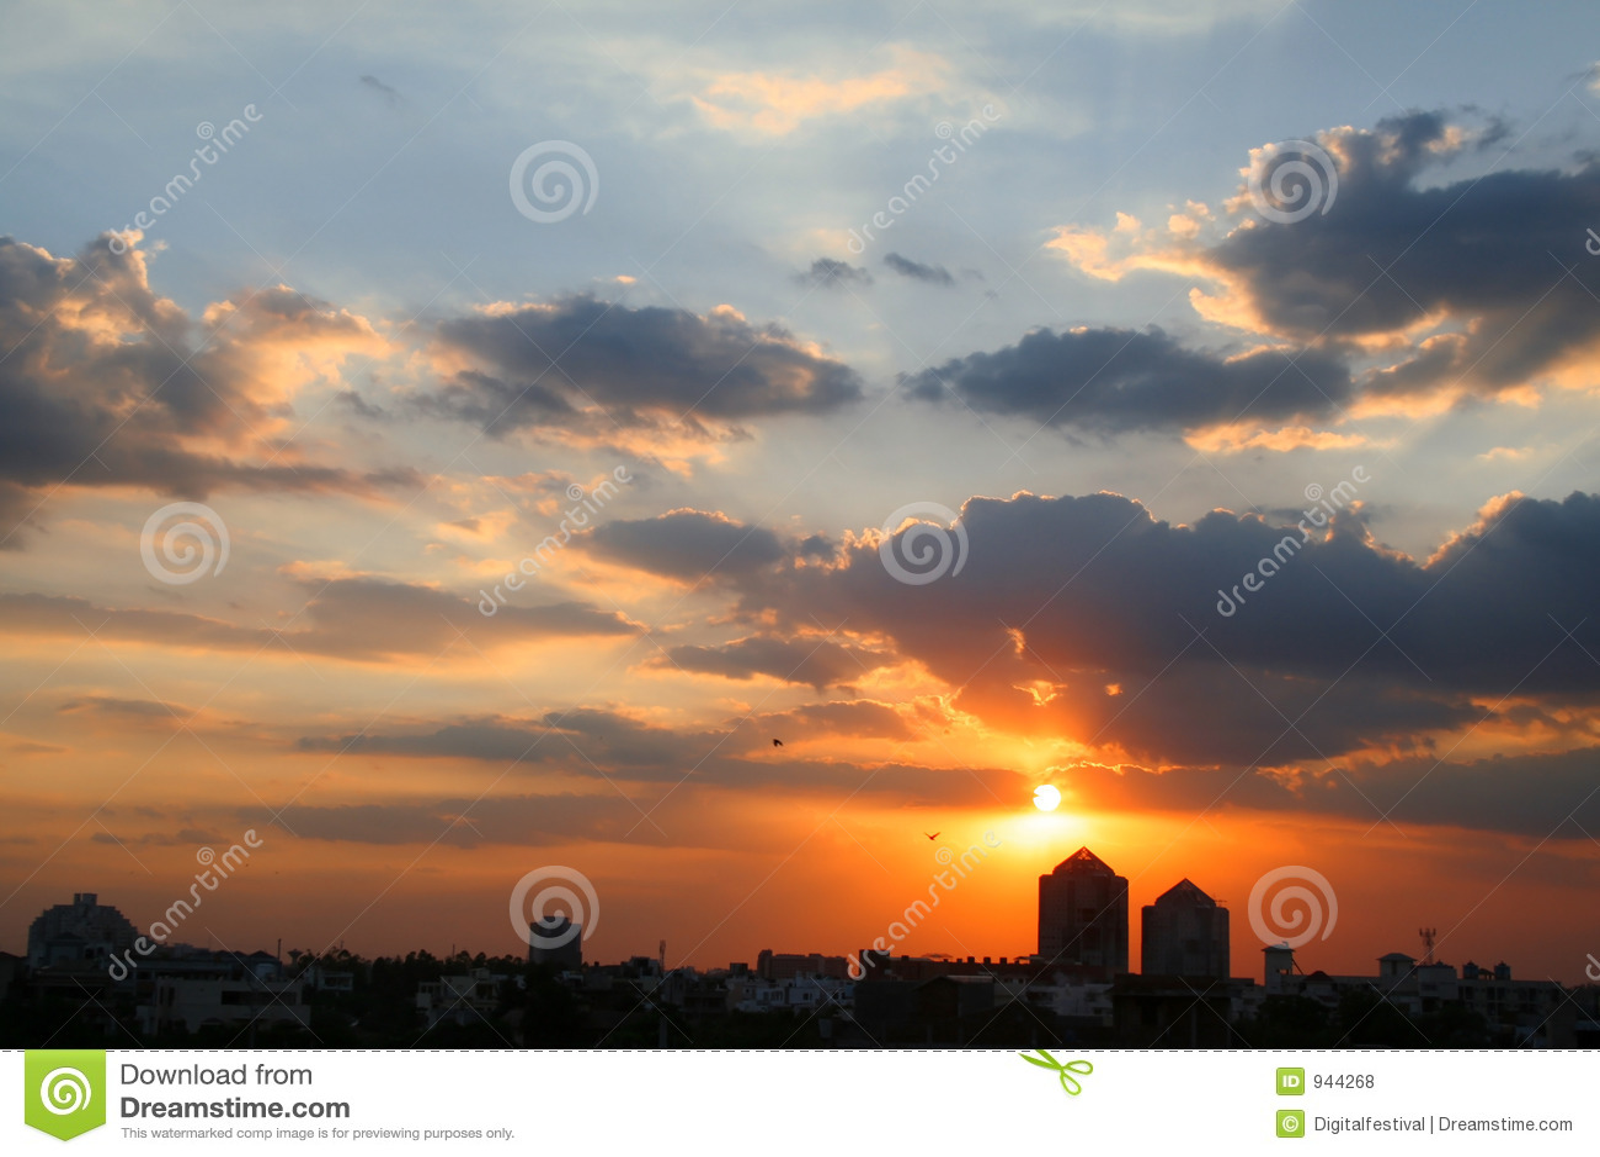 上色gurgaon haryana印度日出日落生动